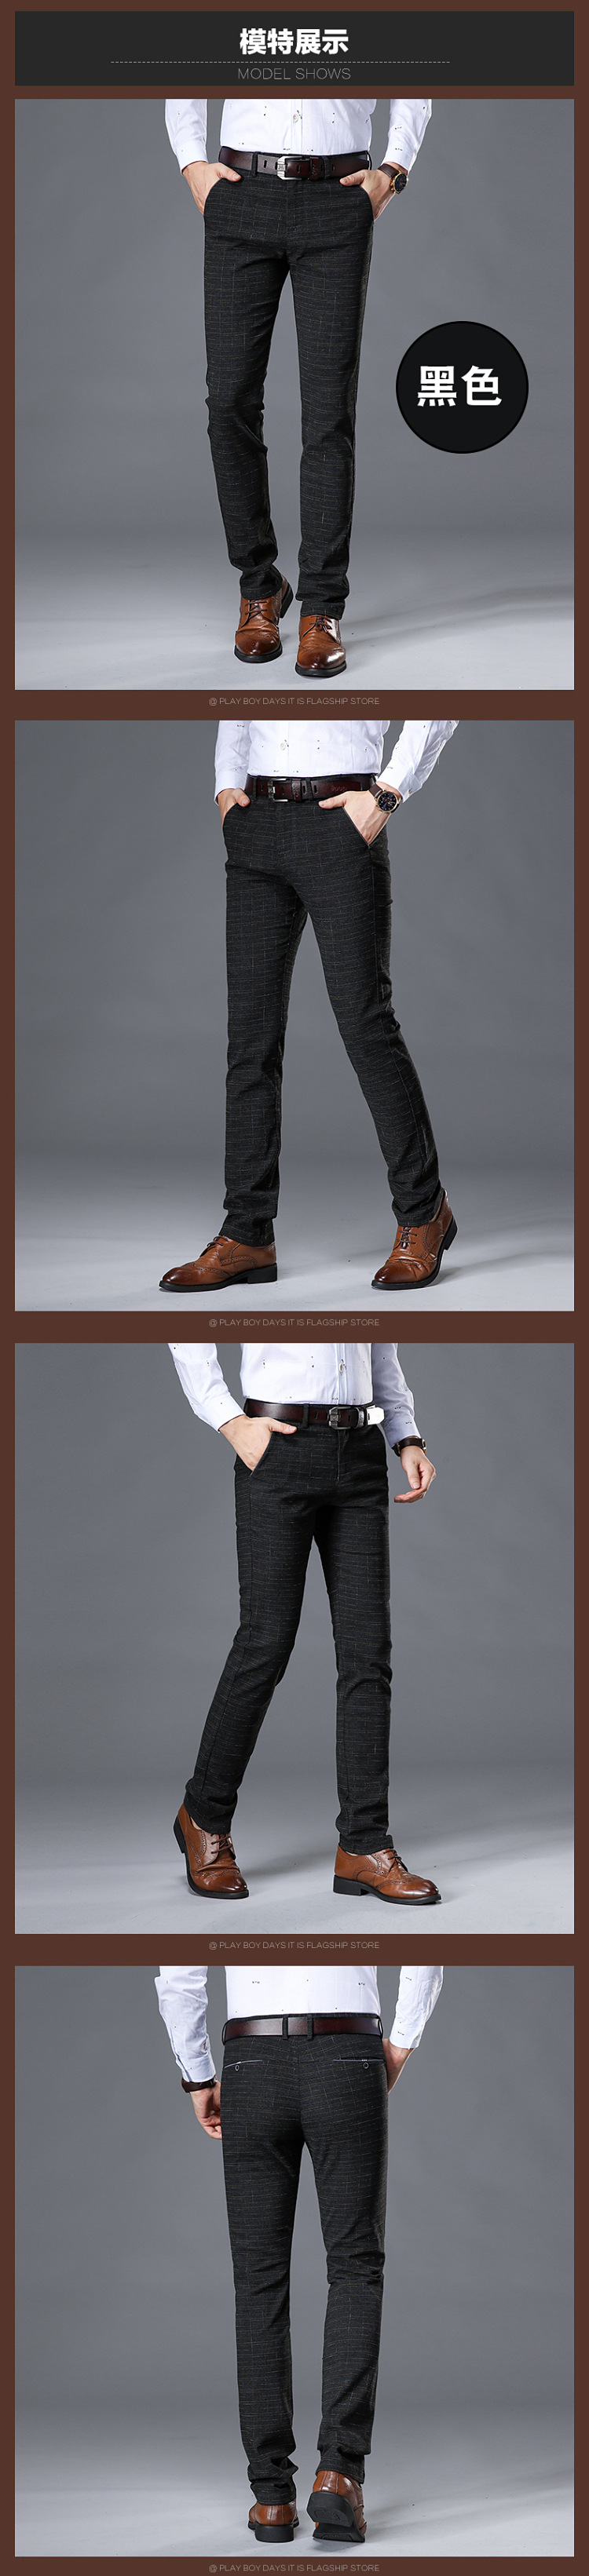 HTB1RaWvavvsK1RjSspdq6AZepXaO 2019 Men's Stretch Stripe Casual Pants Men's Four Seasons High Quality Business Trousers Men's Straight Trousers Harem Pants